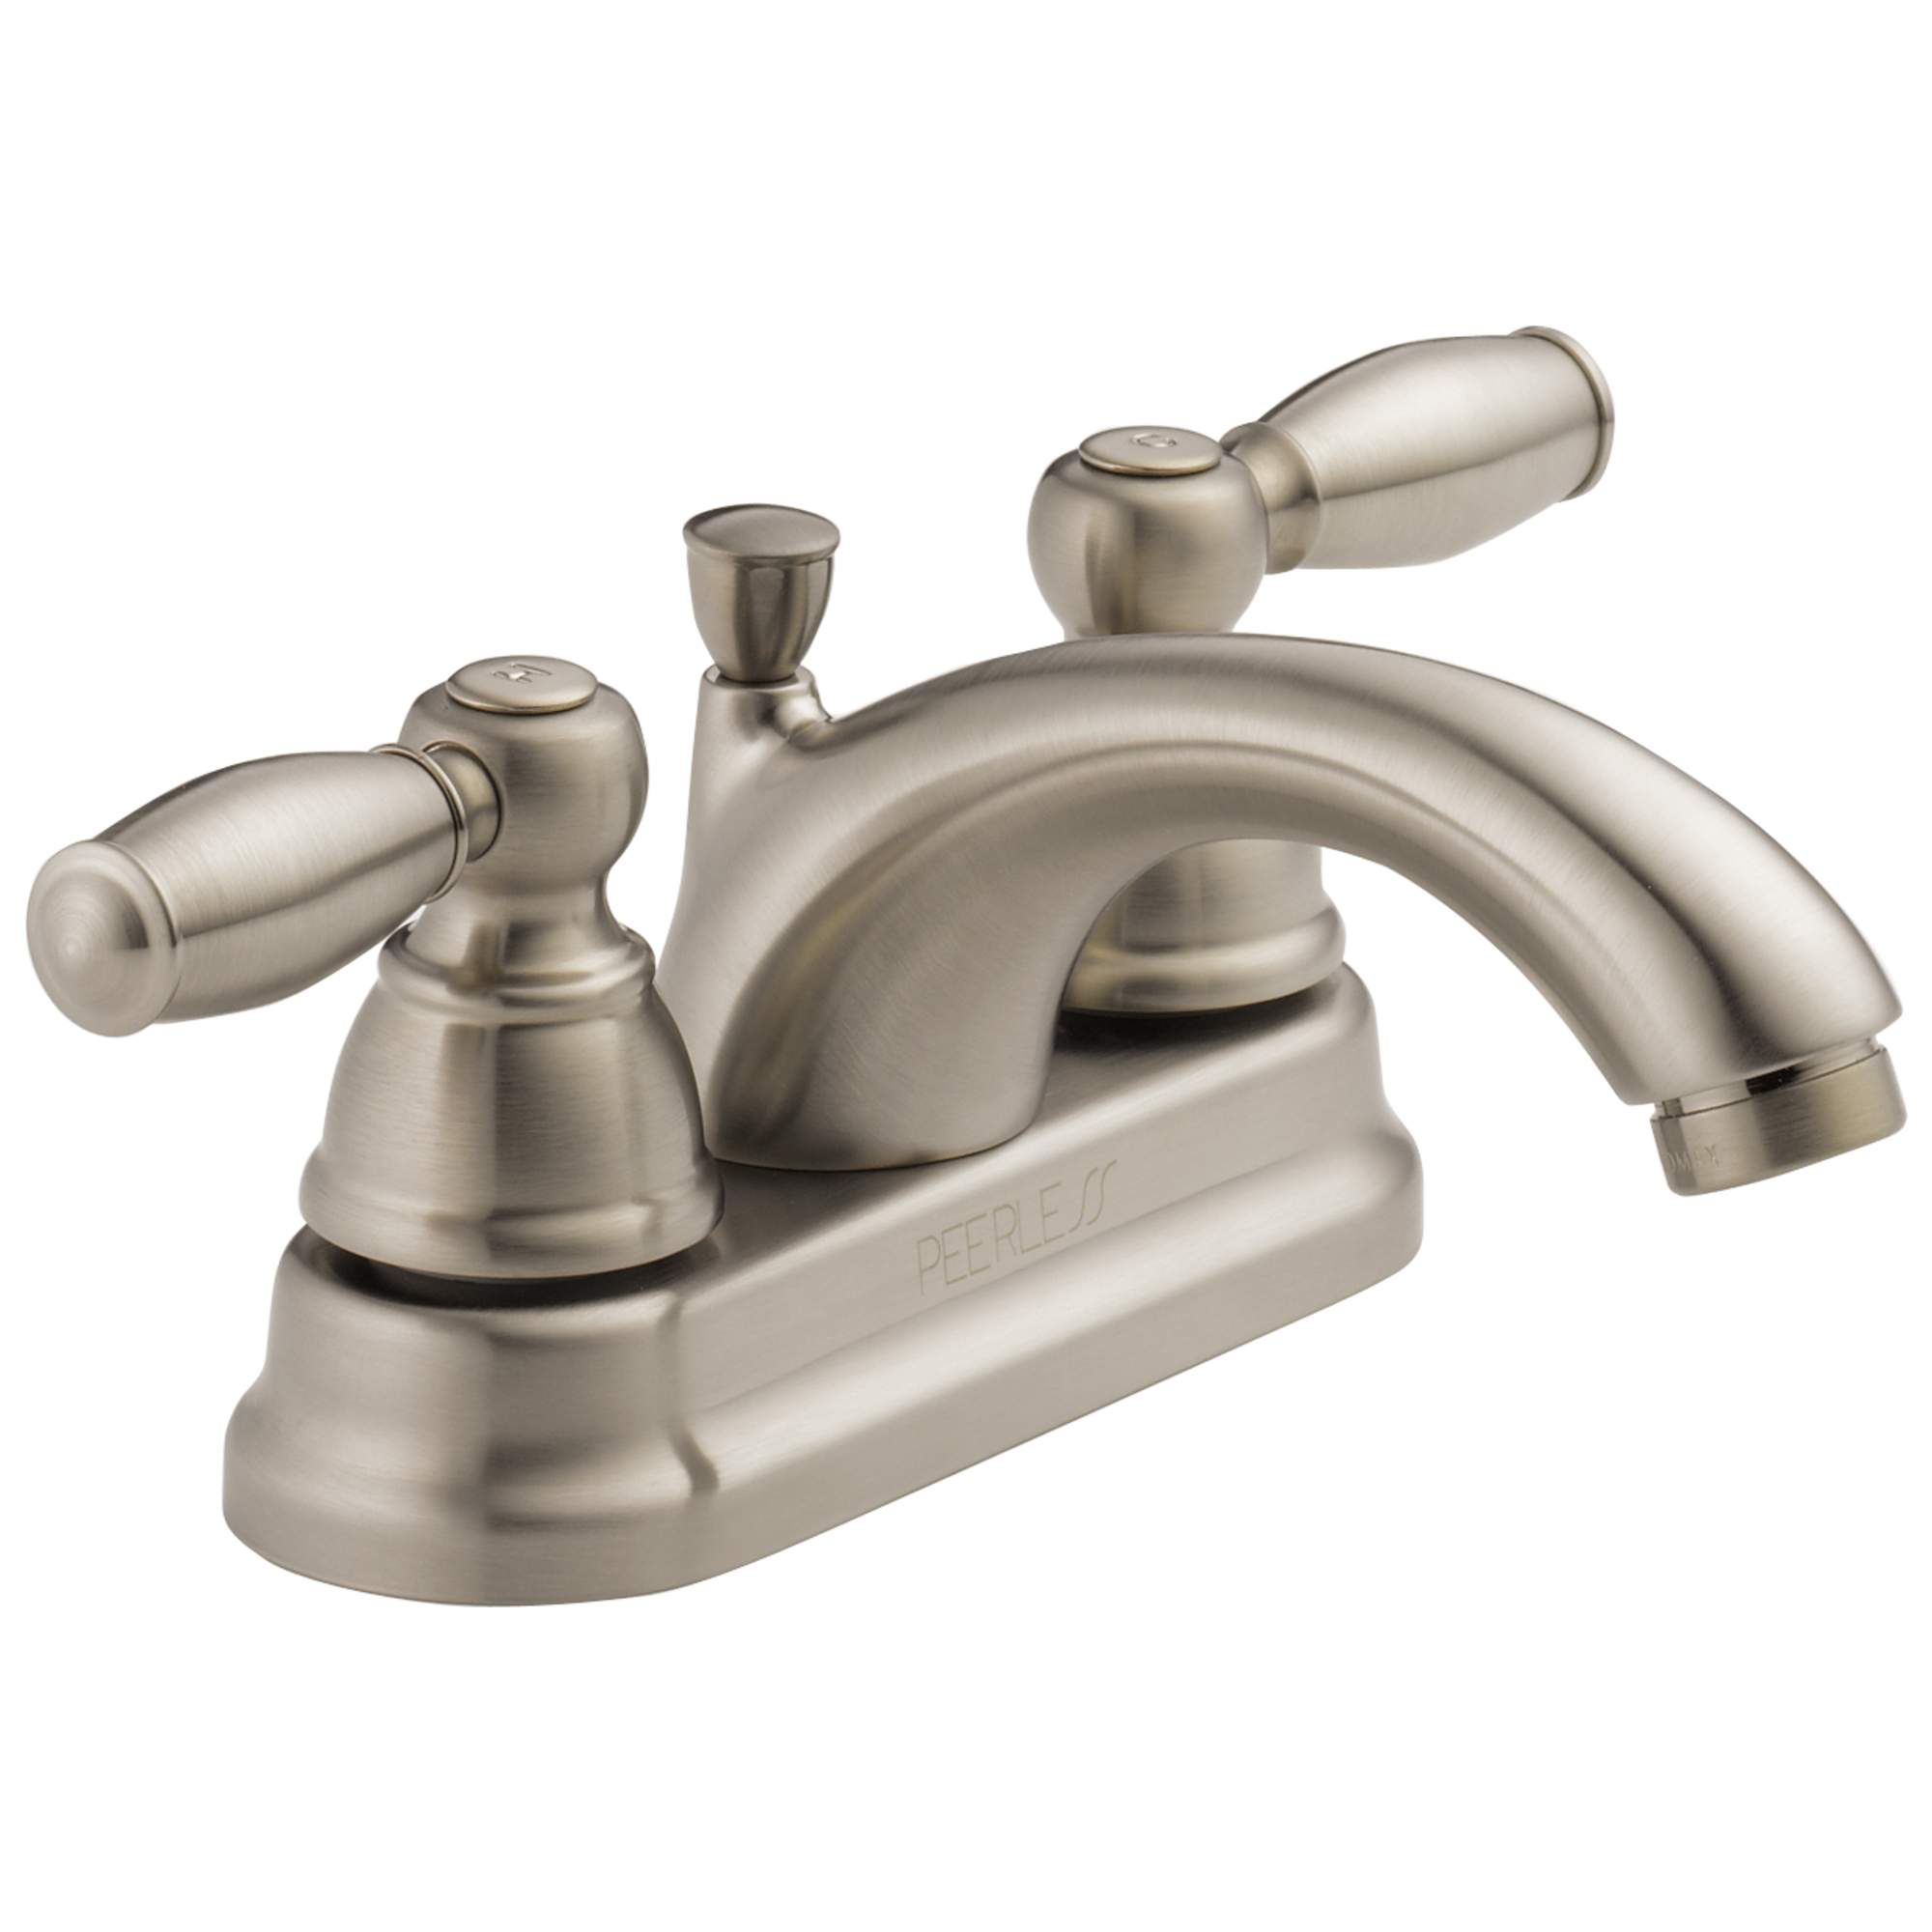 Peerless Bathroom Faucets: Peerless-P299675LF-BN Apex, 2 Handle Lavatory Faucet